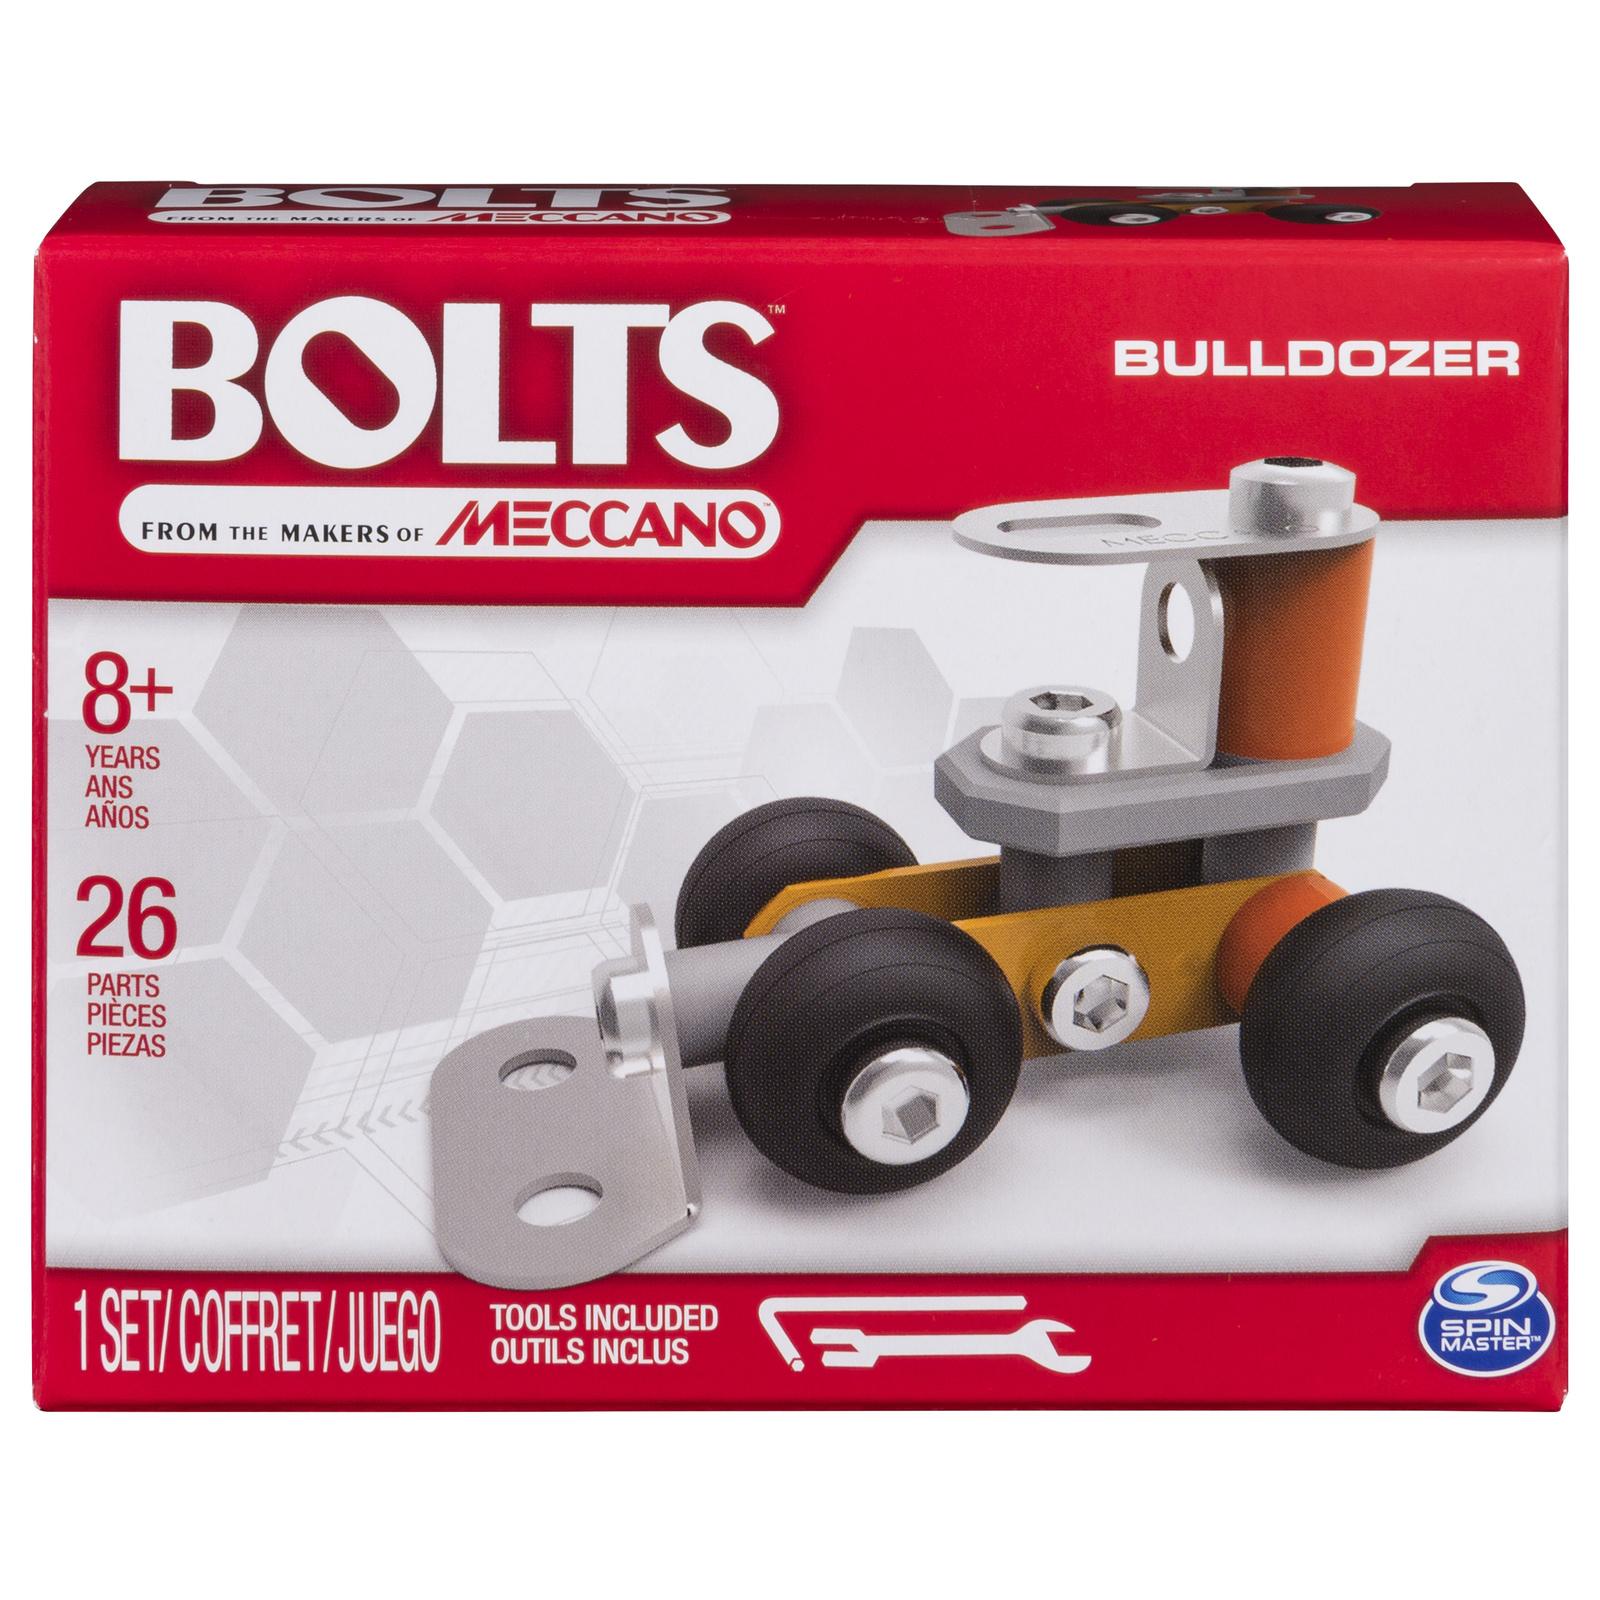 Meccano: Bolts Mini Vehicles - Bulldozer image